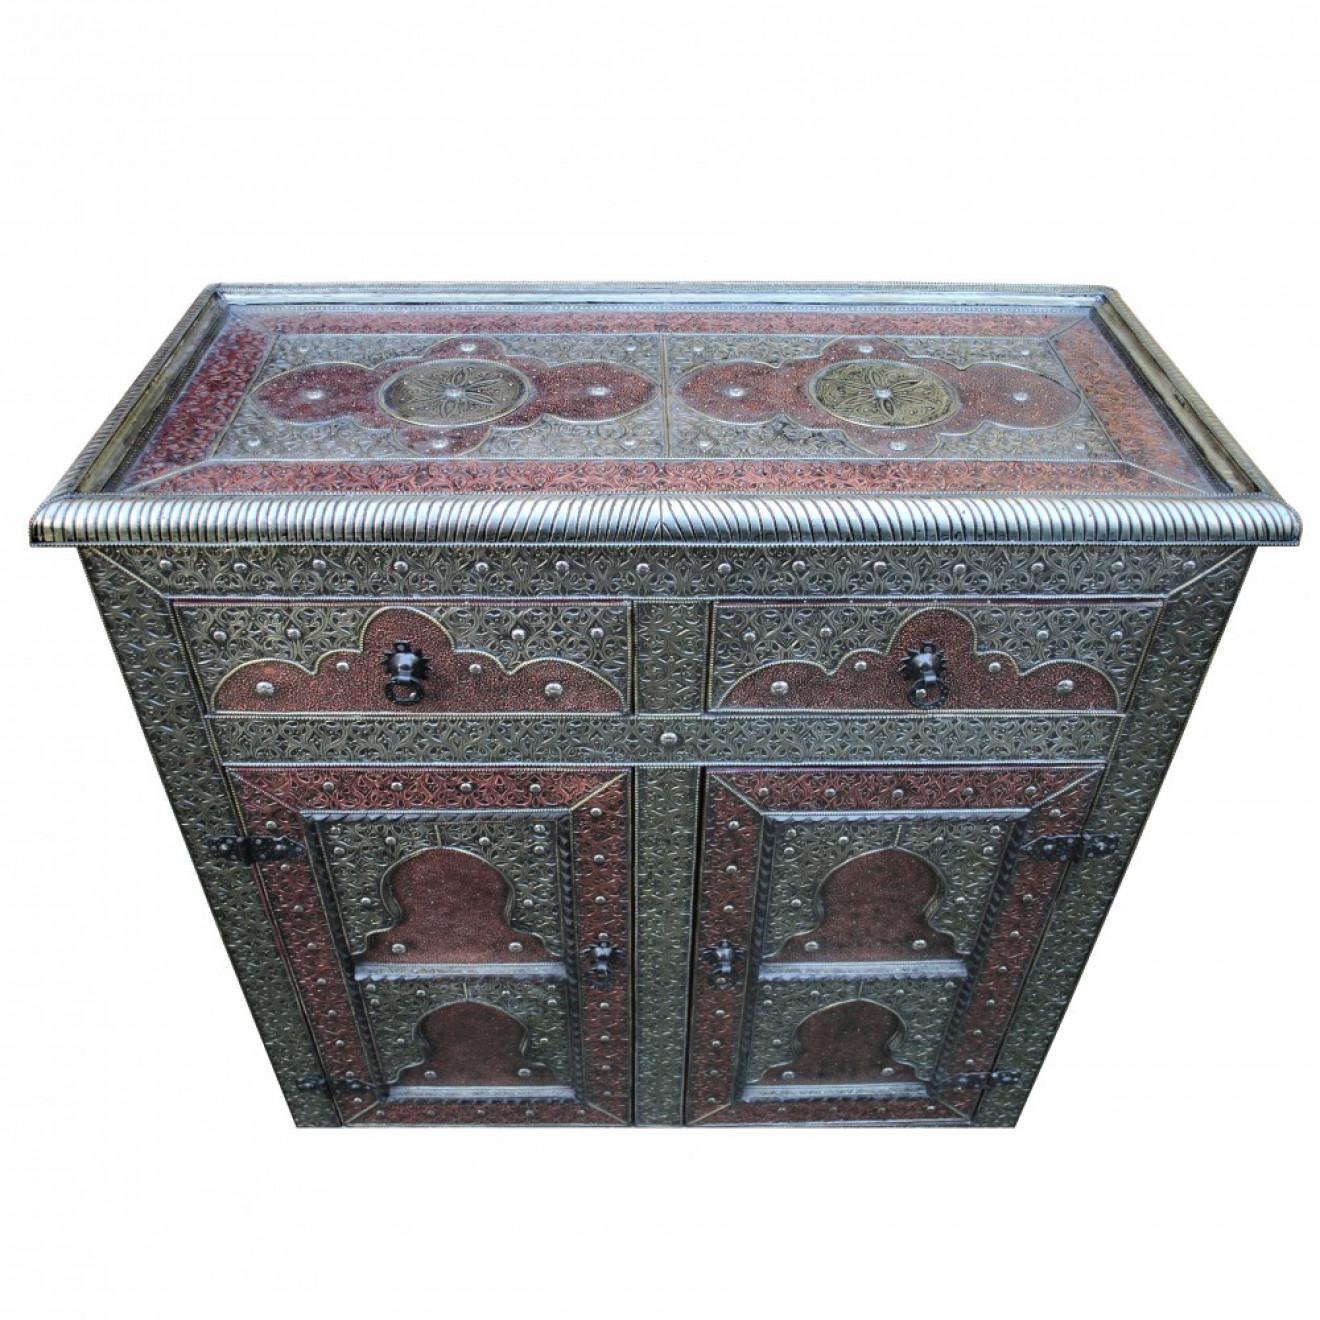 Orientalische Kommode orientalische kommode